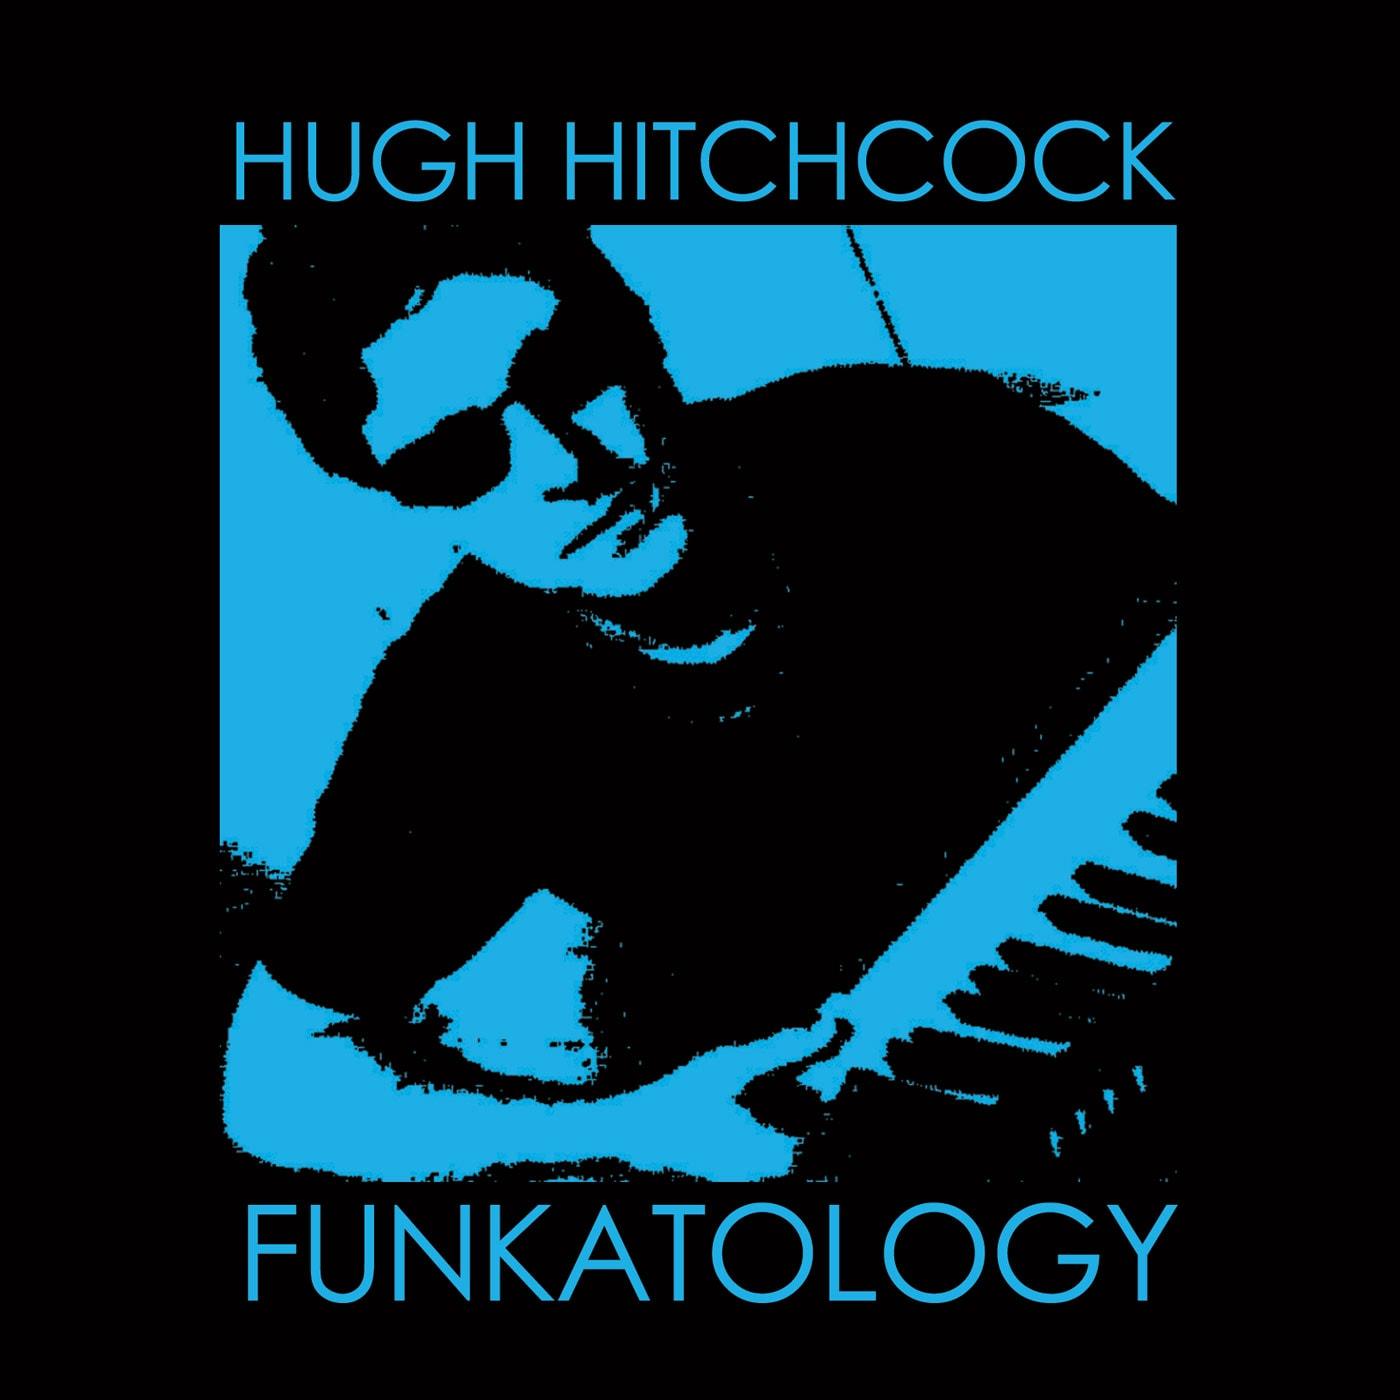 Funkatology by Hugh Hitchcock album cover